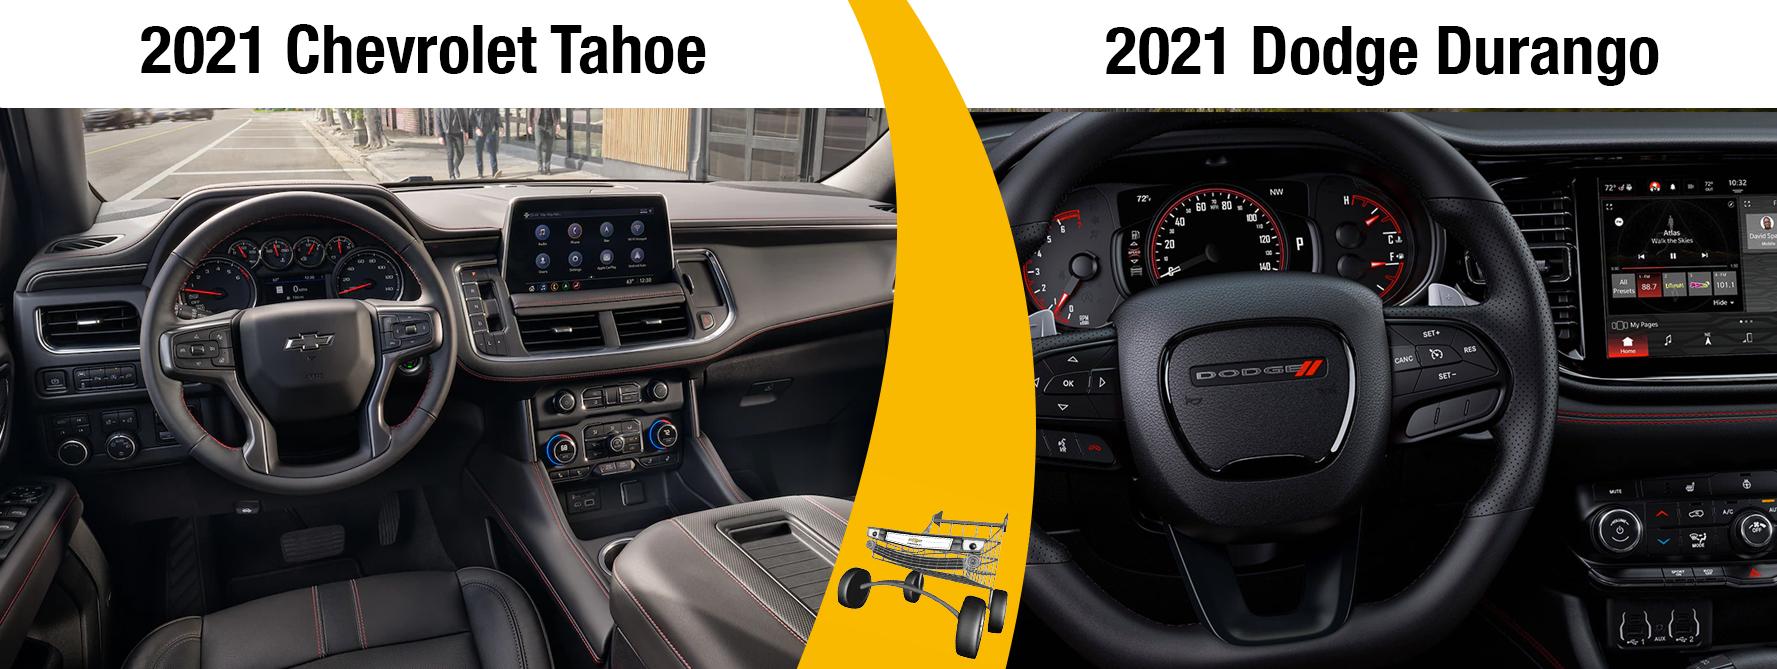 New 2021 Chevrolet Tahoe Vs. the 2021 Dodge Durango Comparisons